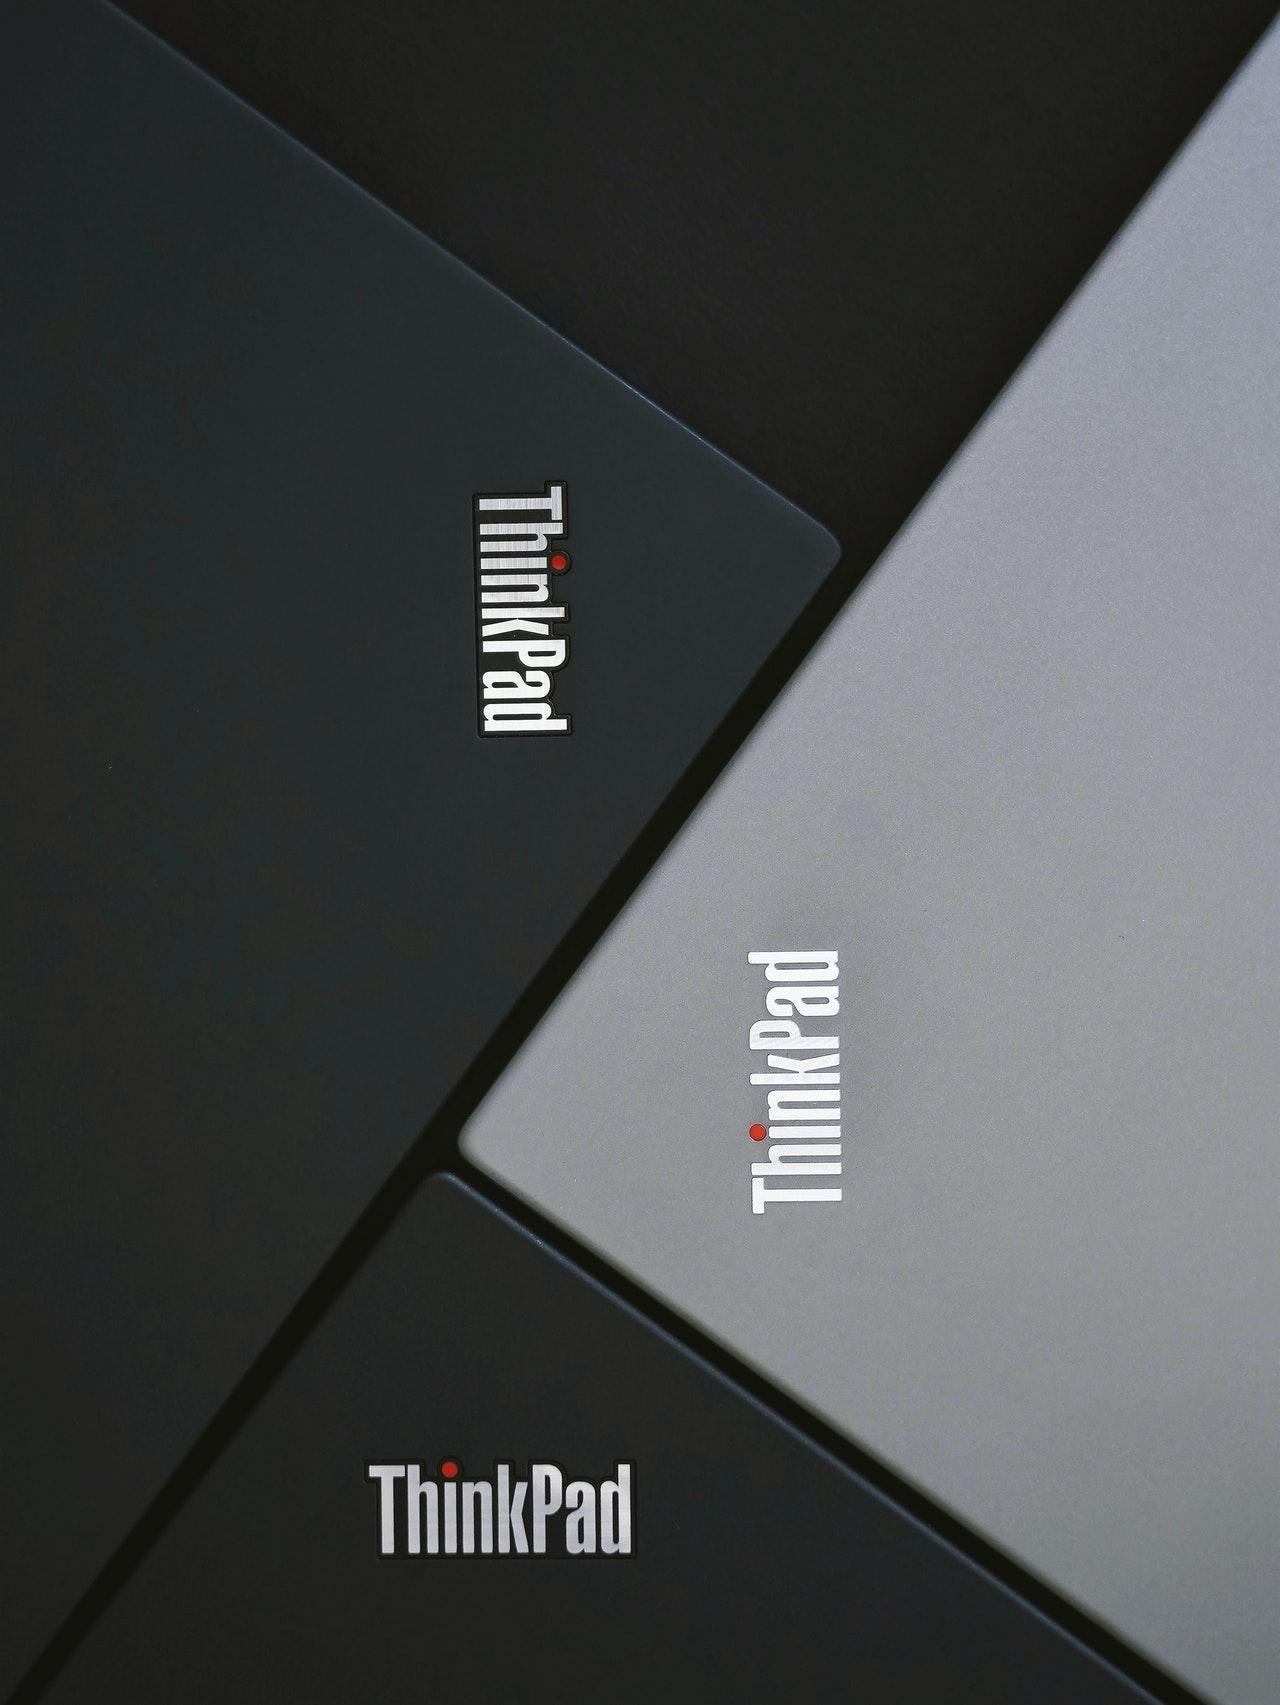 Thinkpad product photography